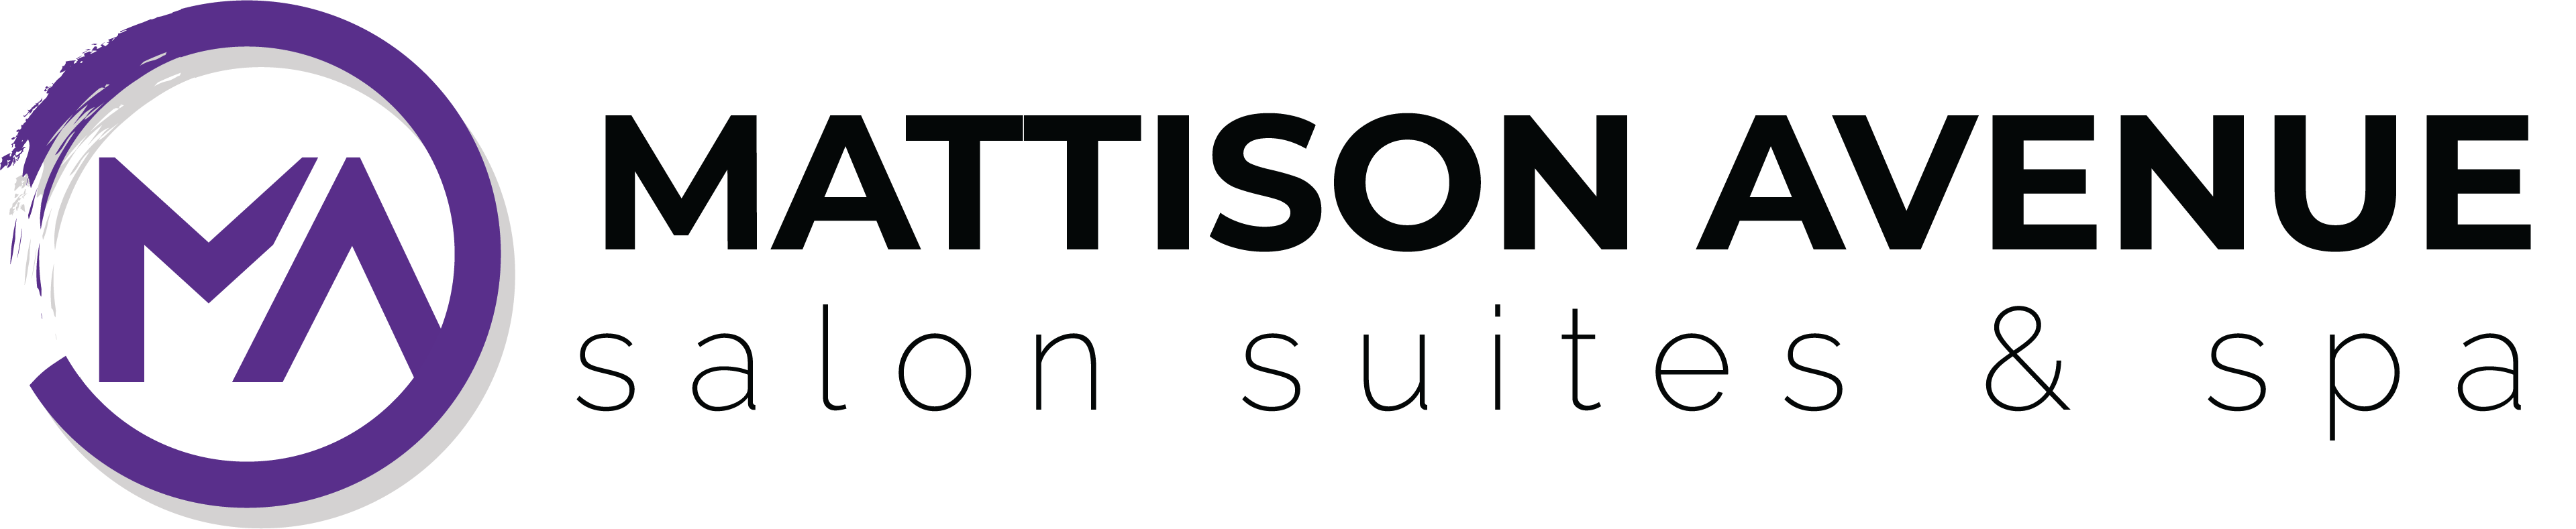 Mattison Avenue Holdings LLC